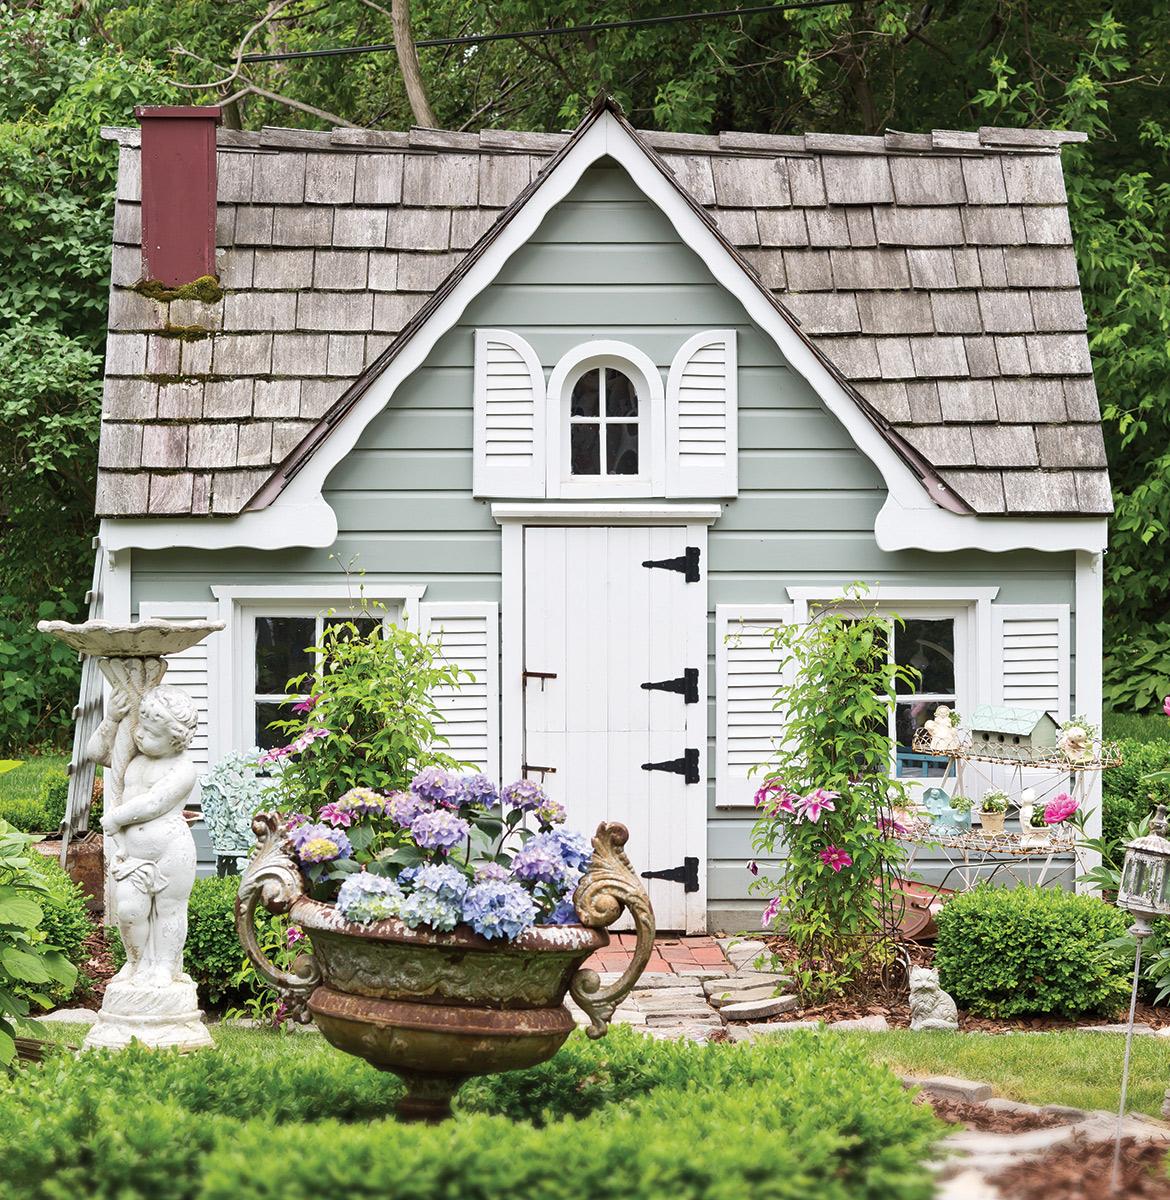 Garden Cottage: The Queen Of Shabby Chic Gardens